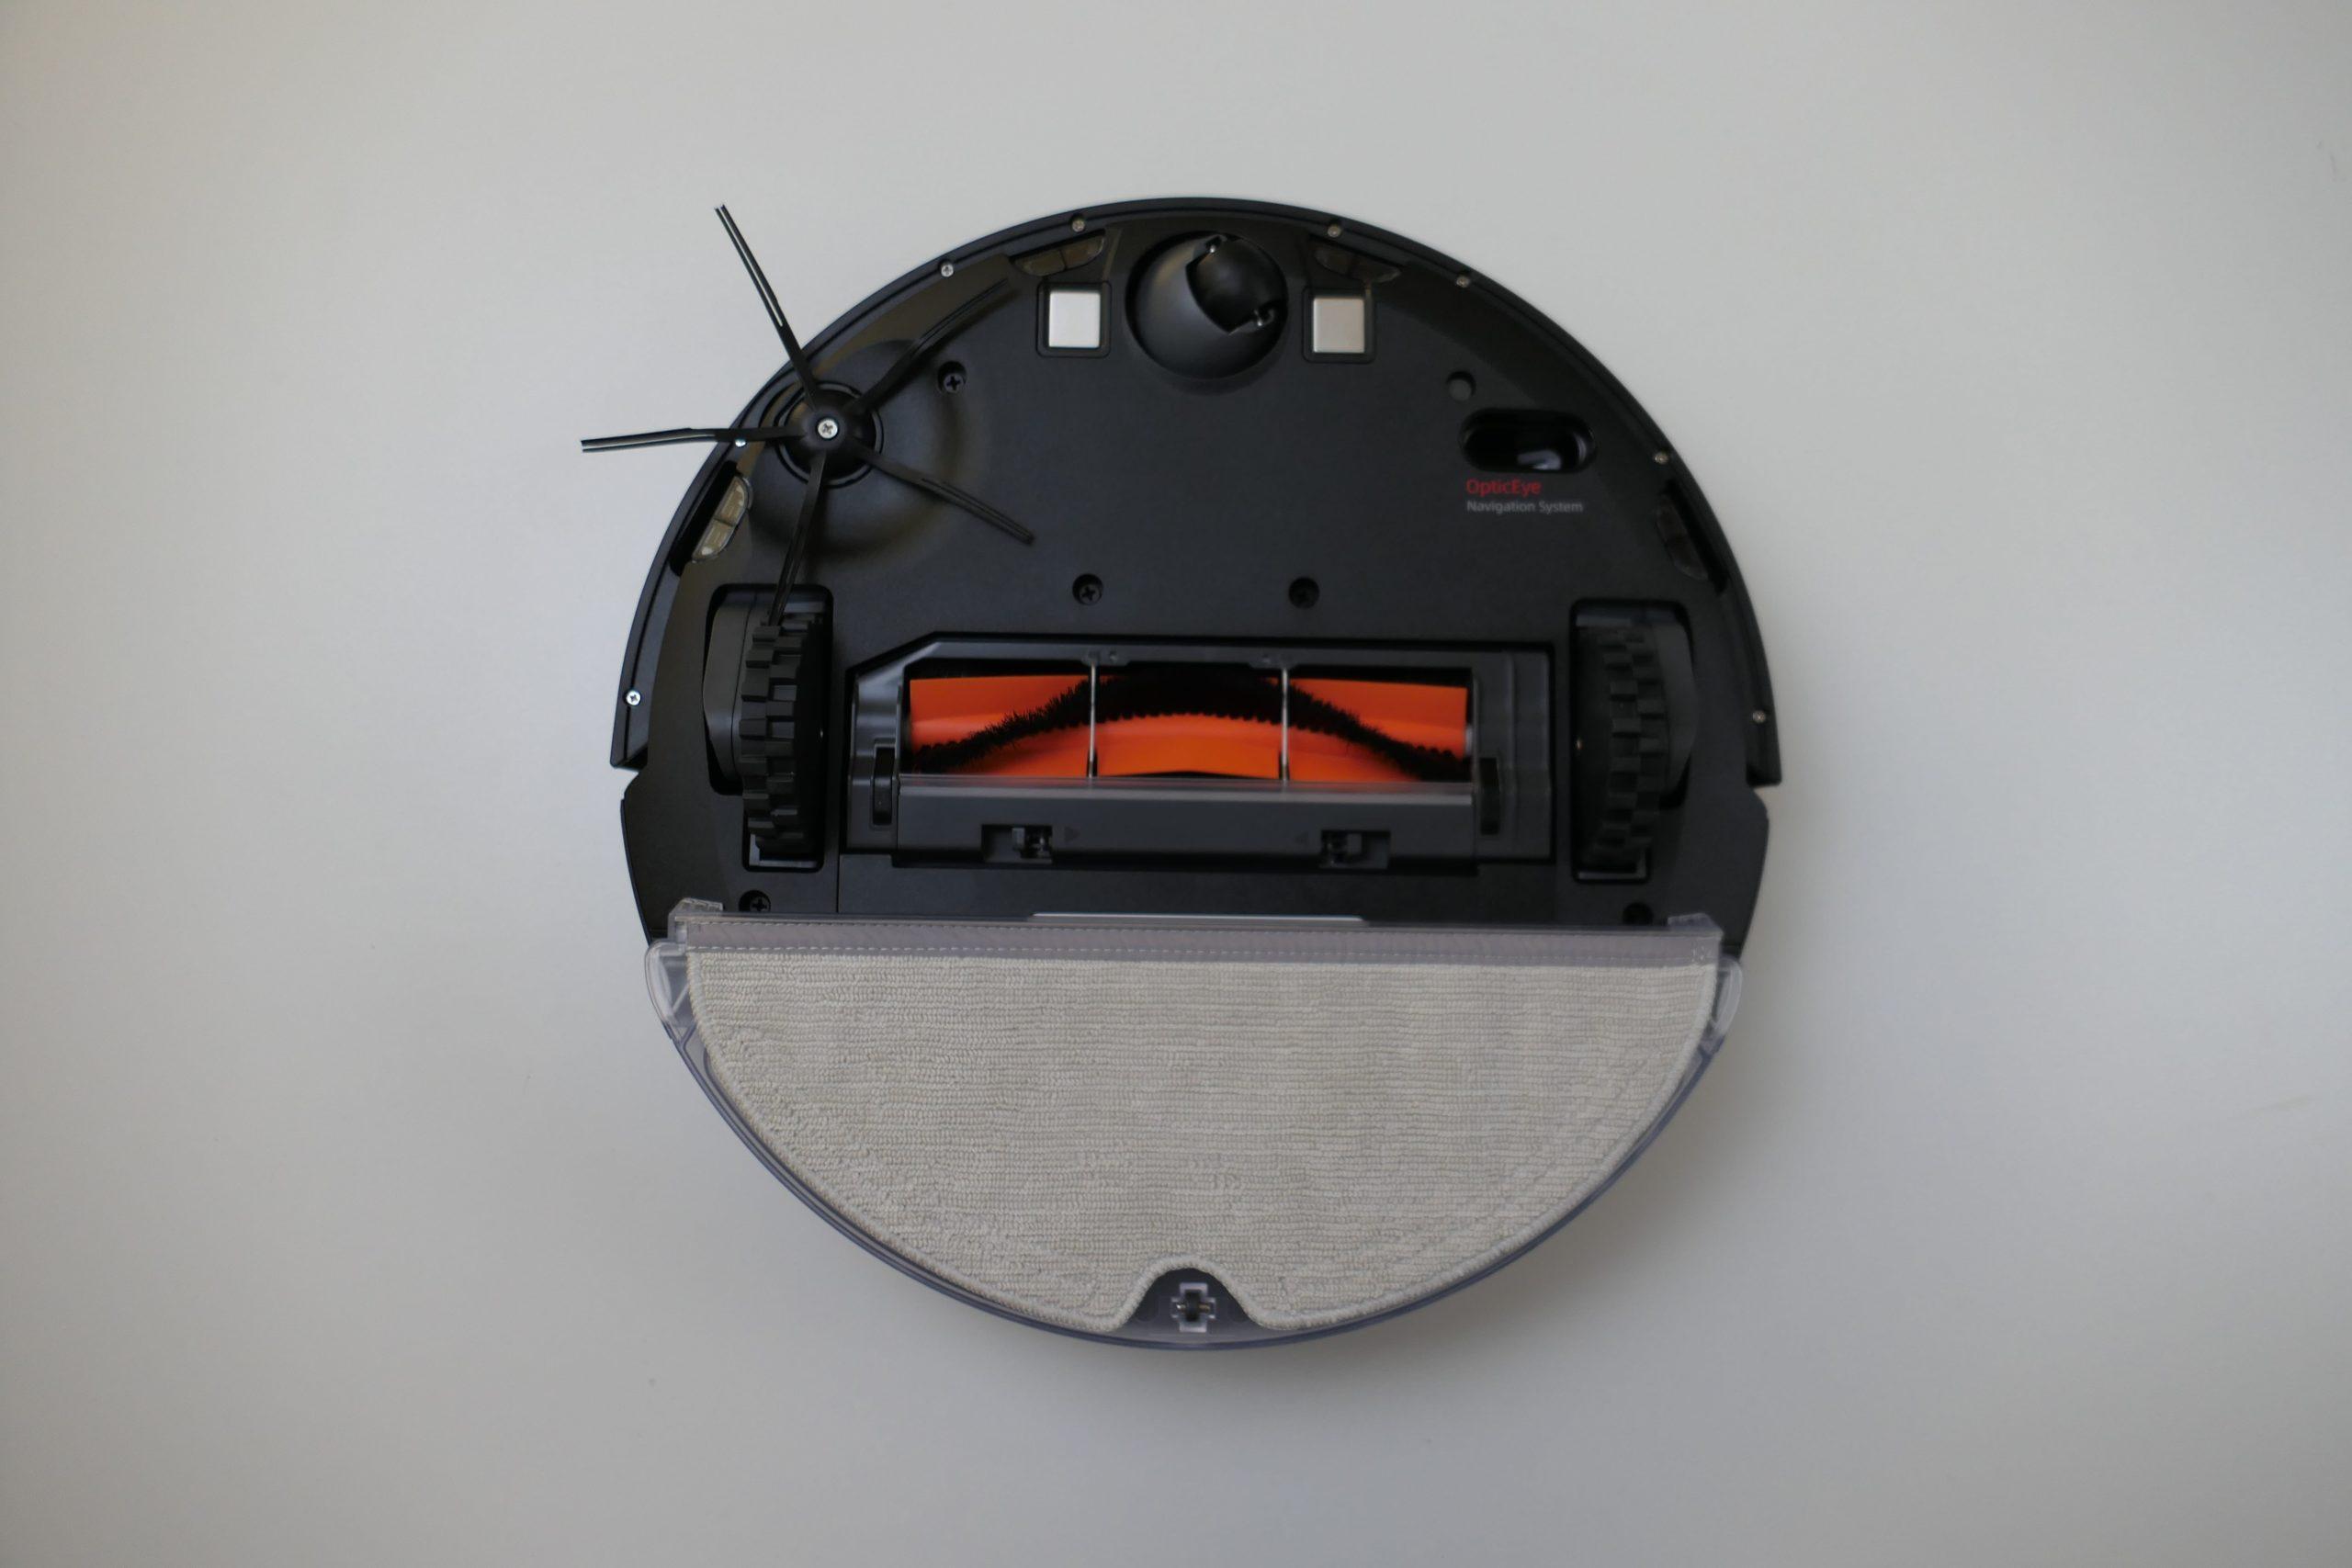 Roborock E4 вид снизу с установленным резервуаром